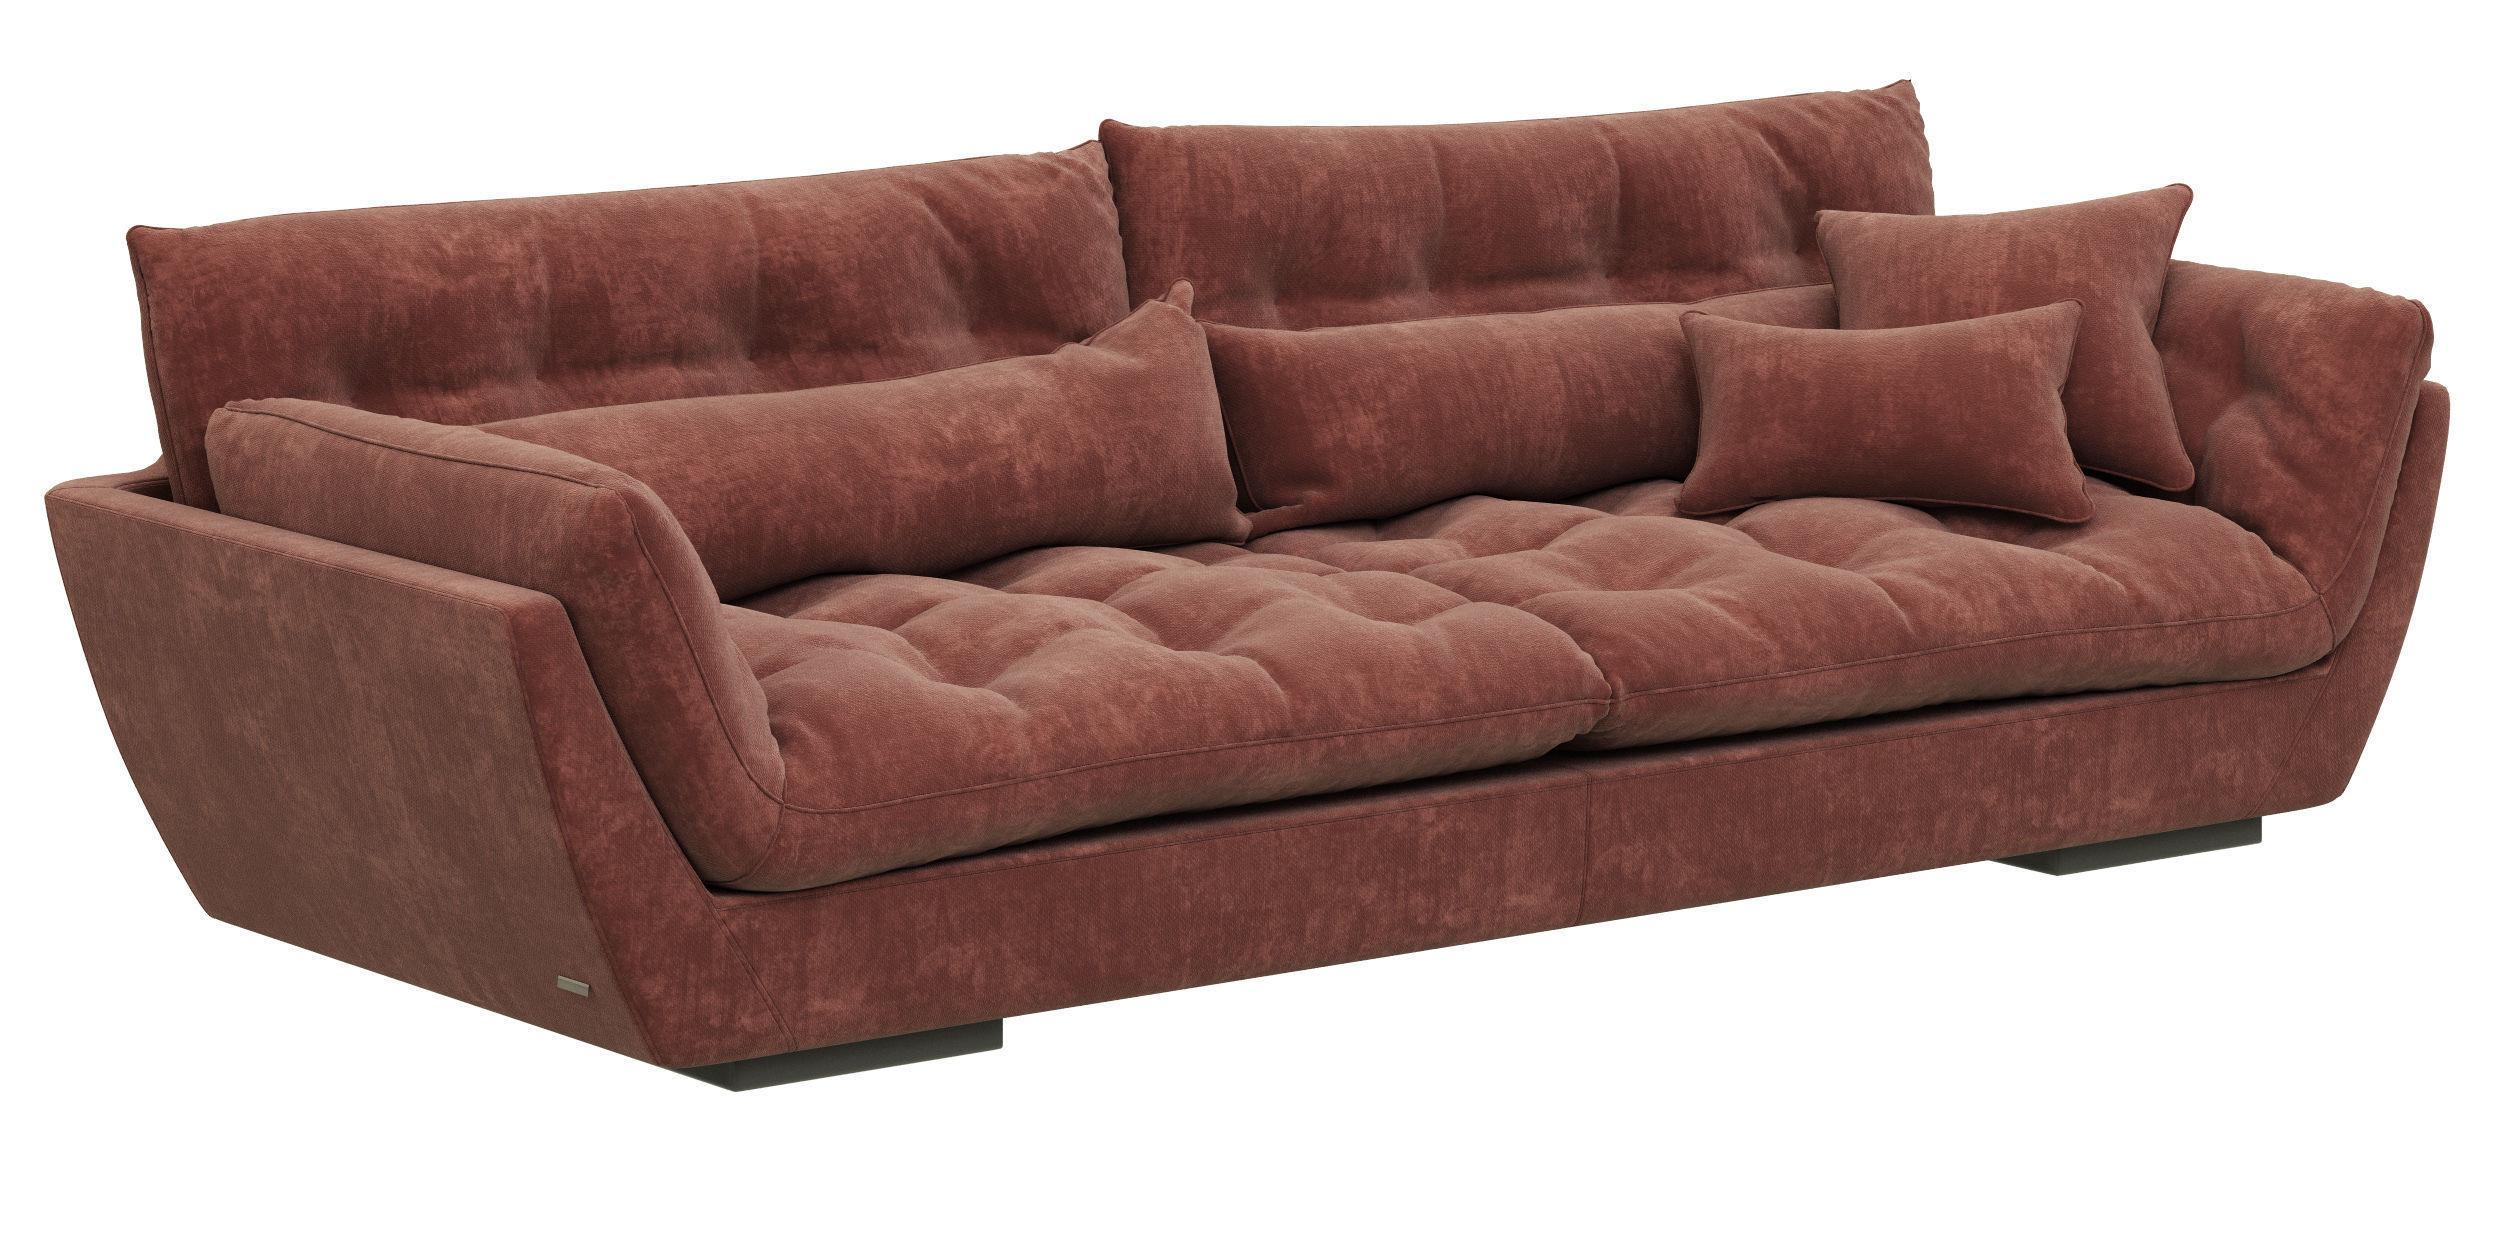 Roche Bobois ORIGINEL Large 4-seat sofa | 3D model